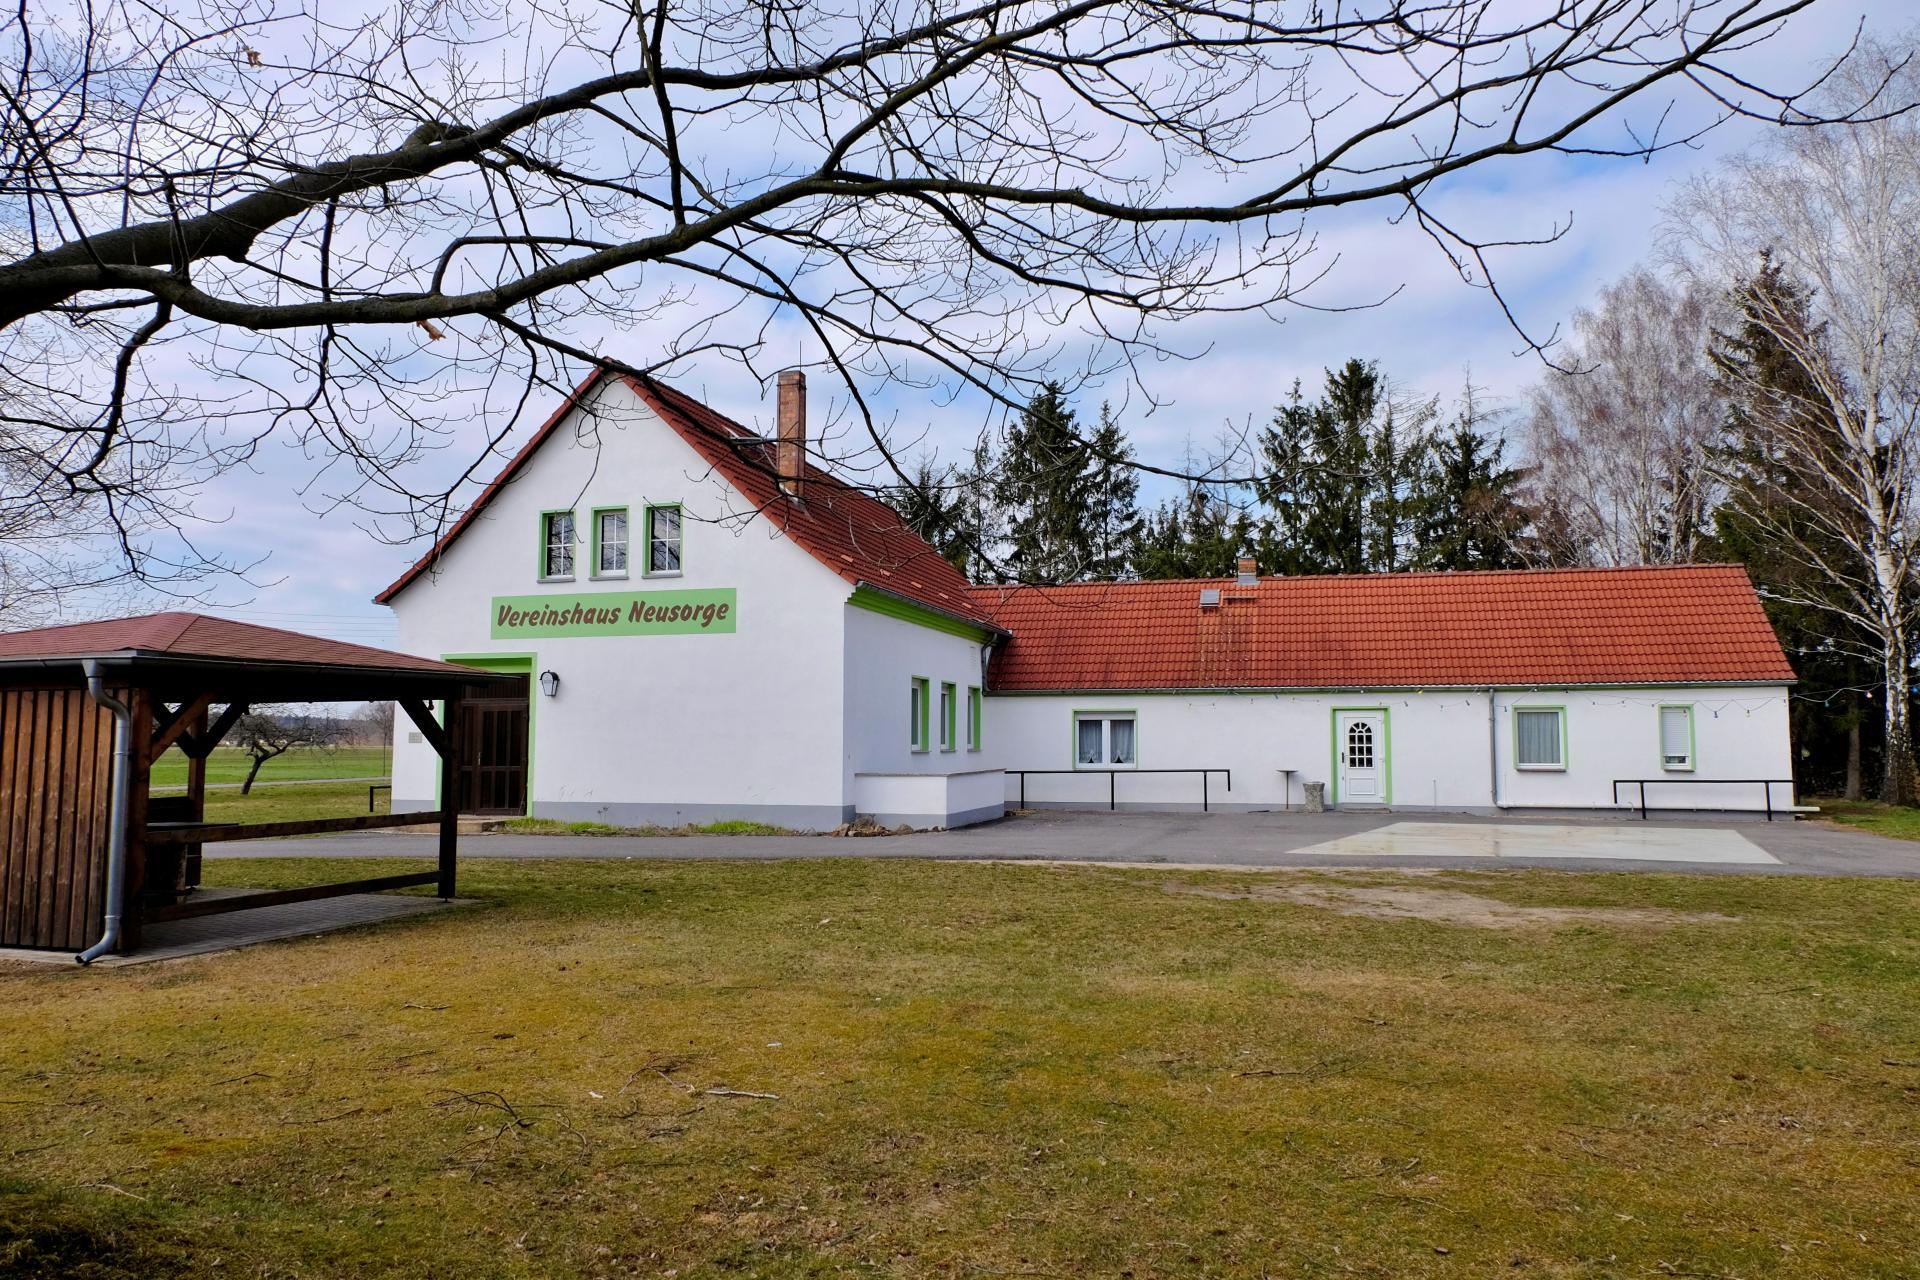 Vereinshaus Neusorge